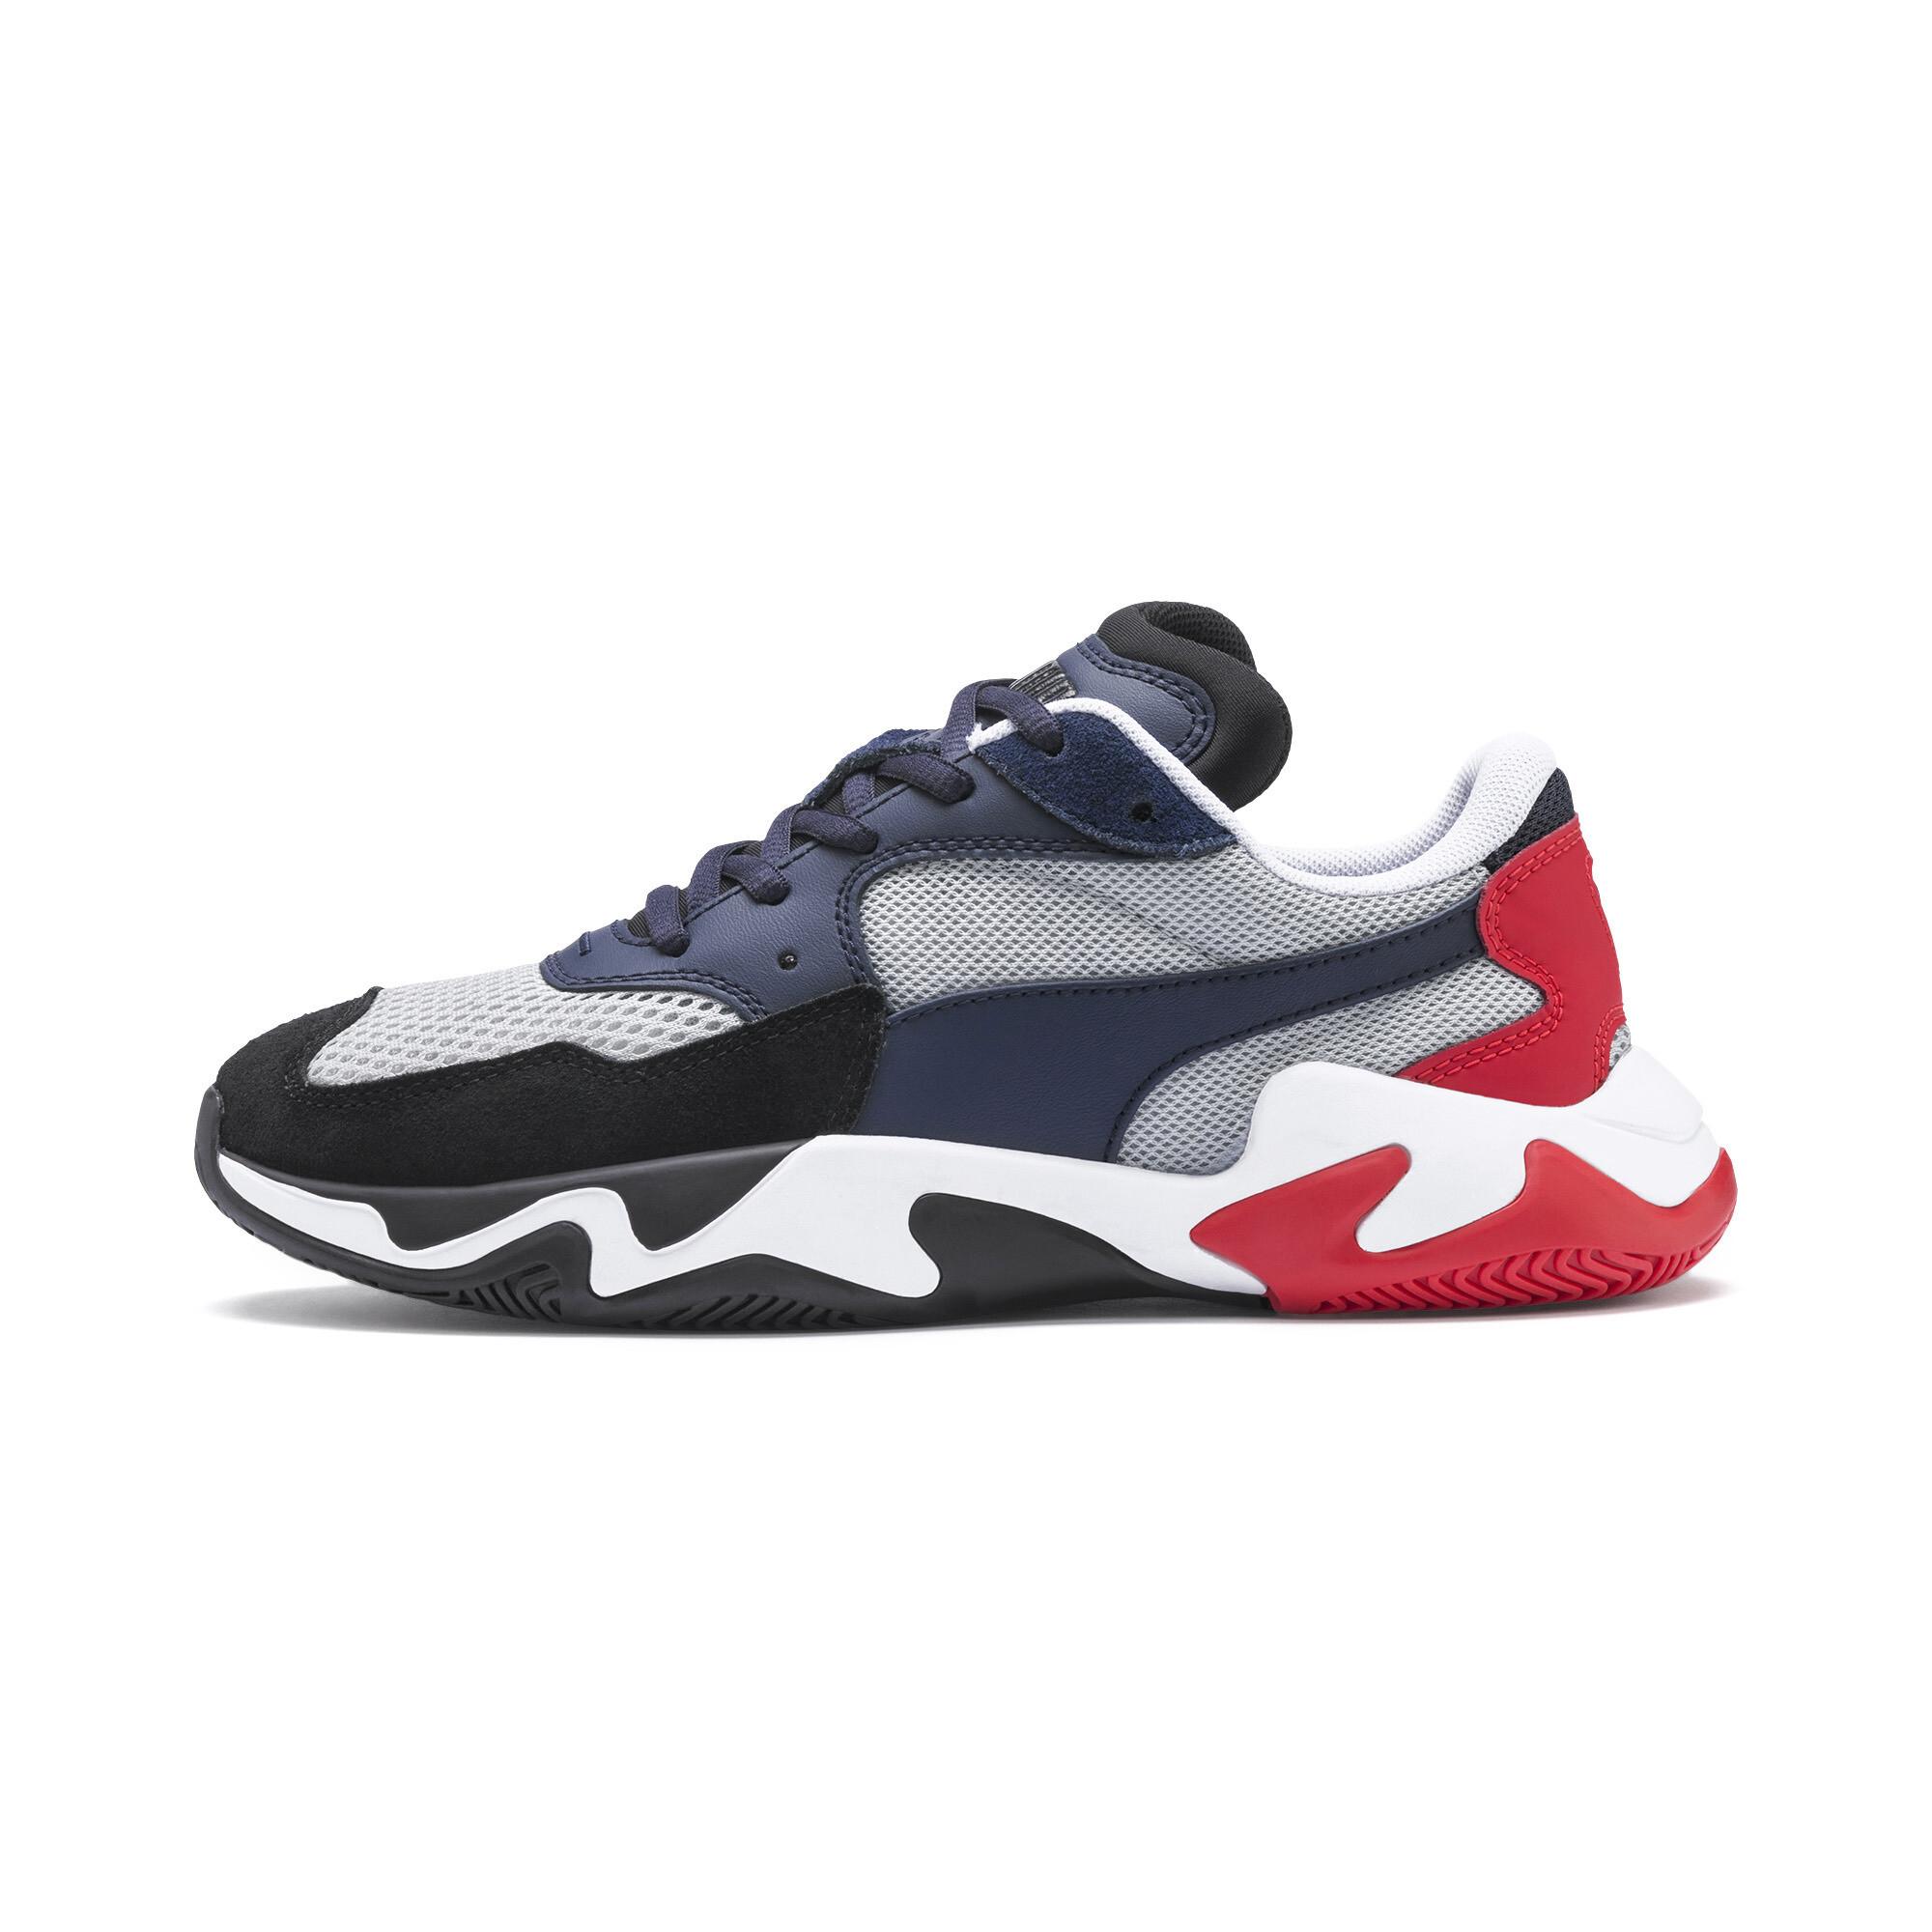 PUMA-Storm-Origin-Sneakers-JR-Kids-Shoe-Kids thumbnail 4